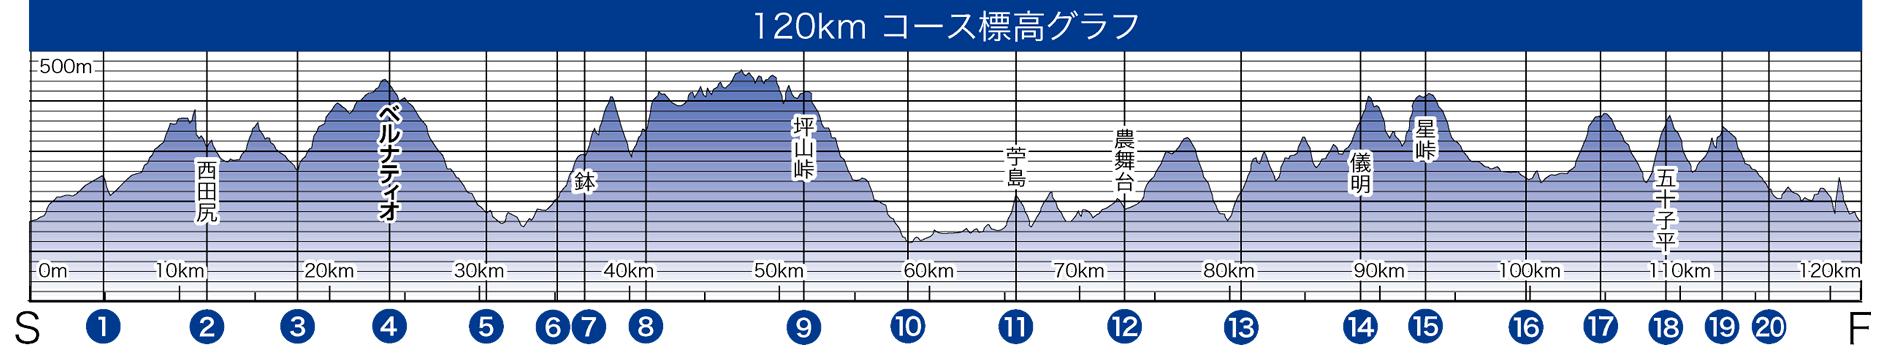 120kmコース標高グラフ